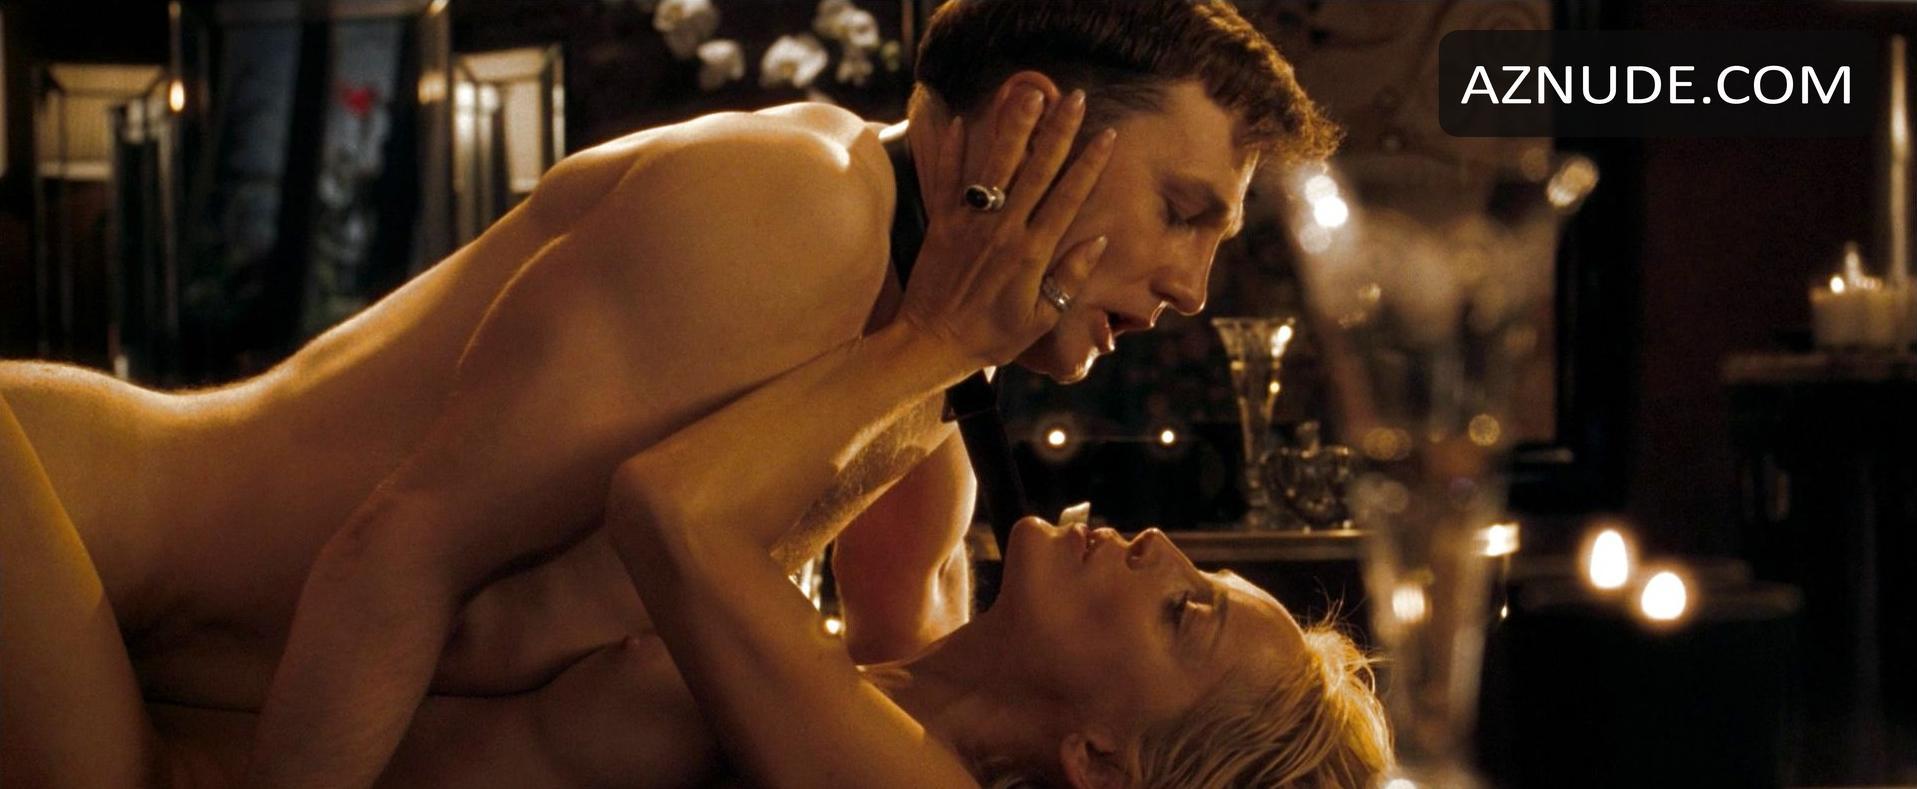 Basic instinct sex scenes nice